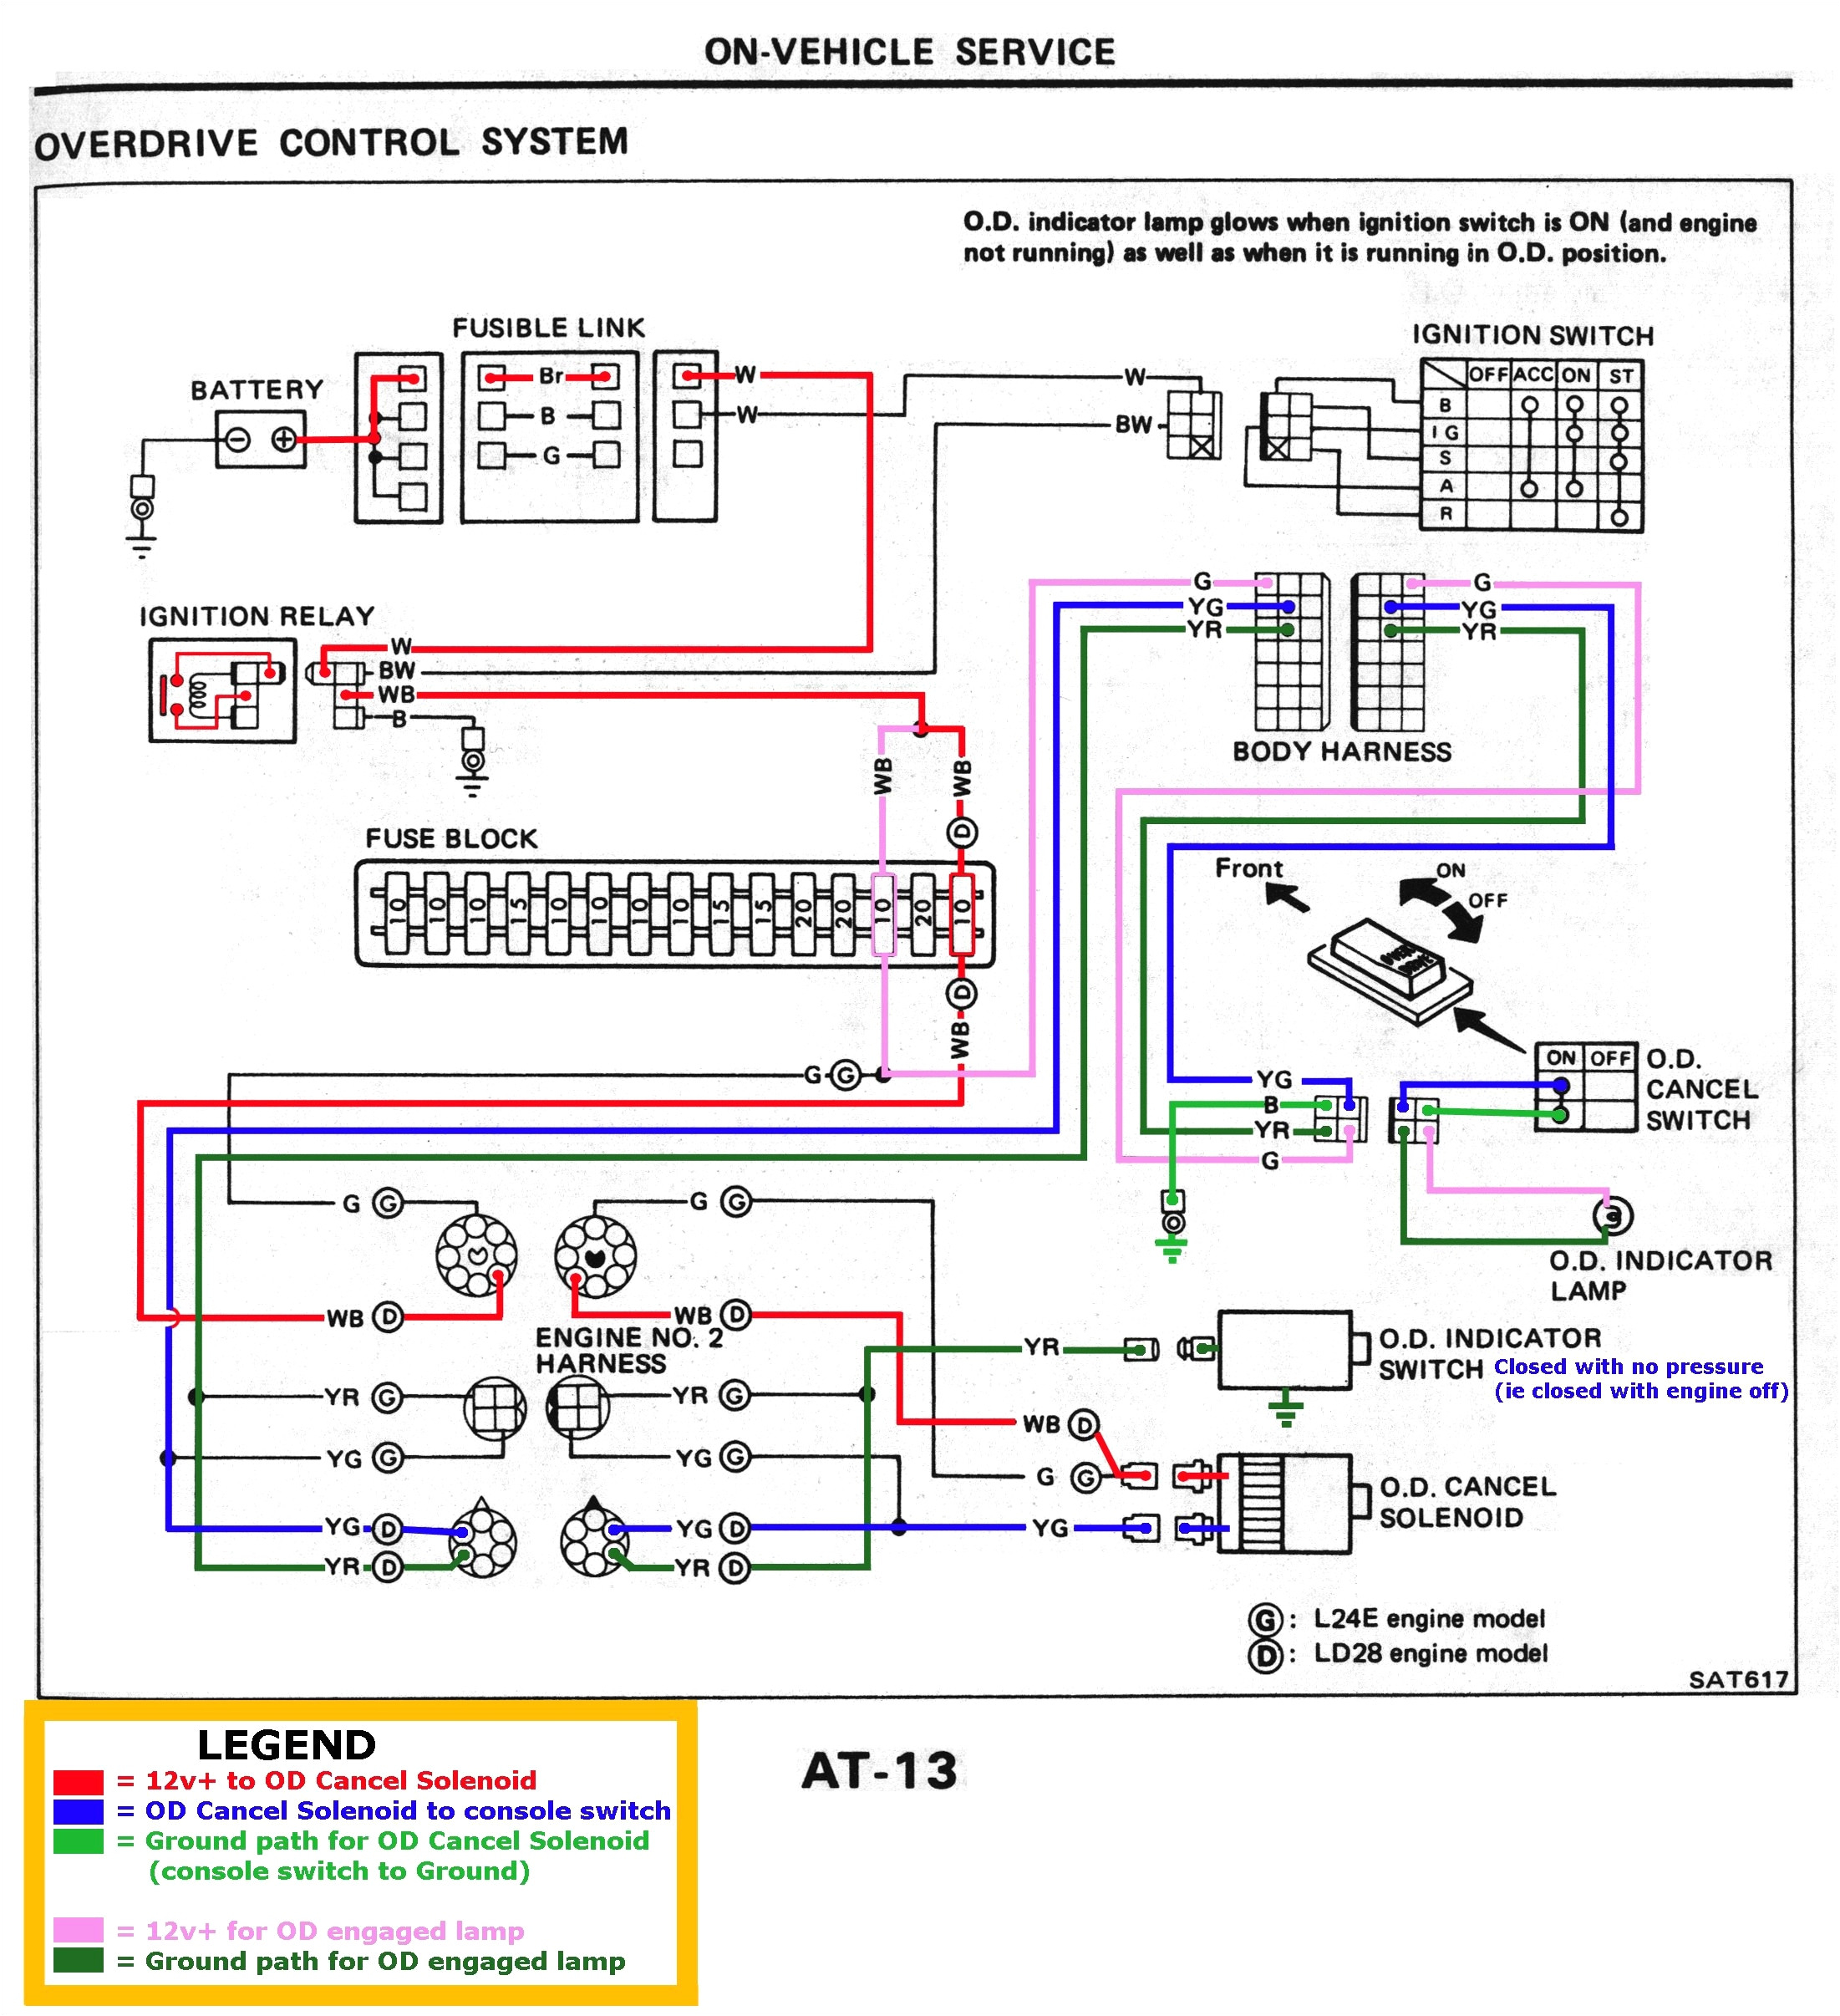 e diagrams g micwavewirings wiring diagram e diagrams g micwavewirings